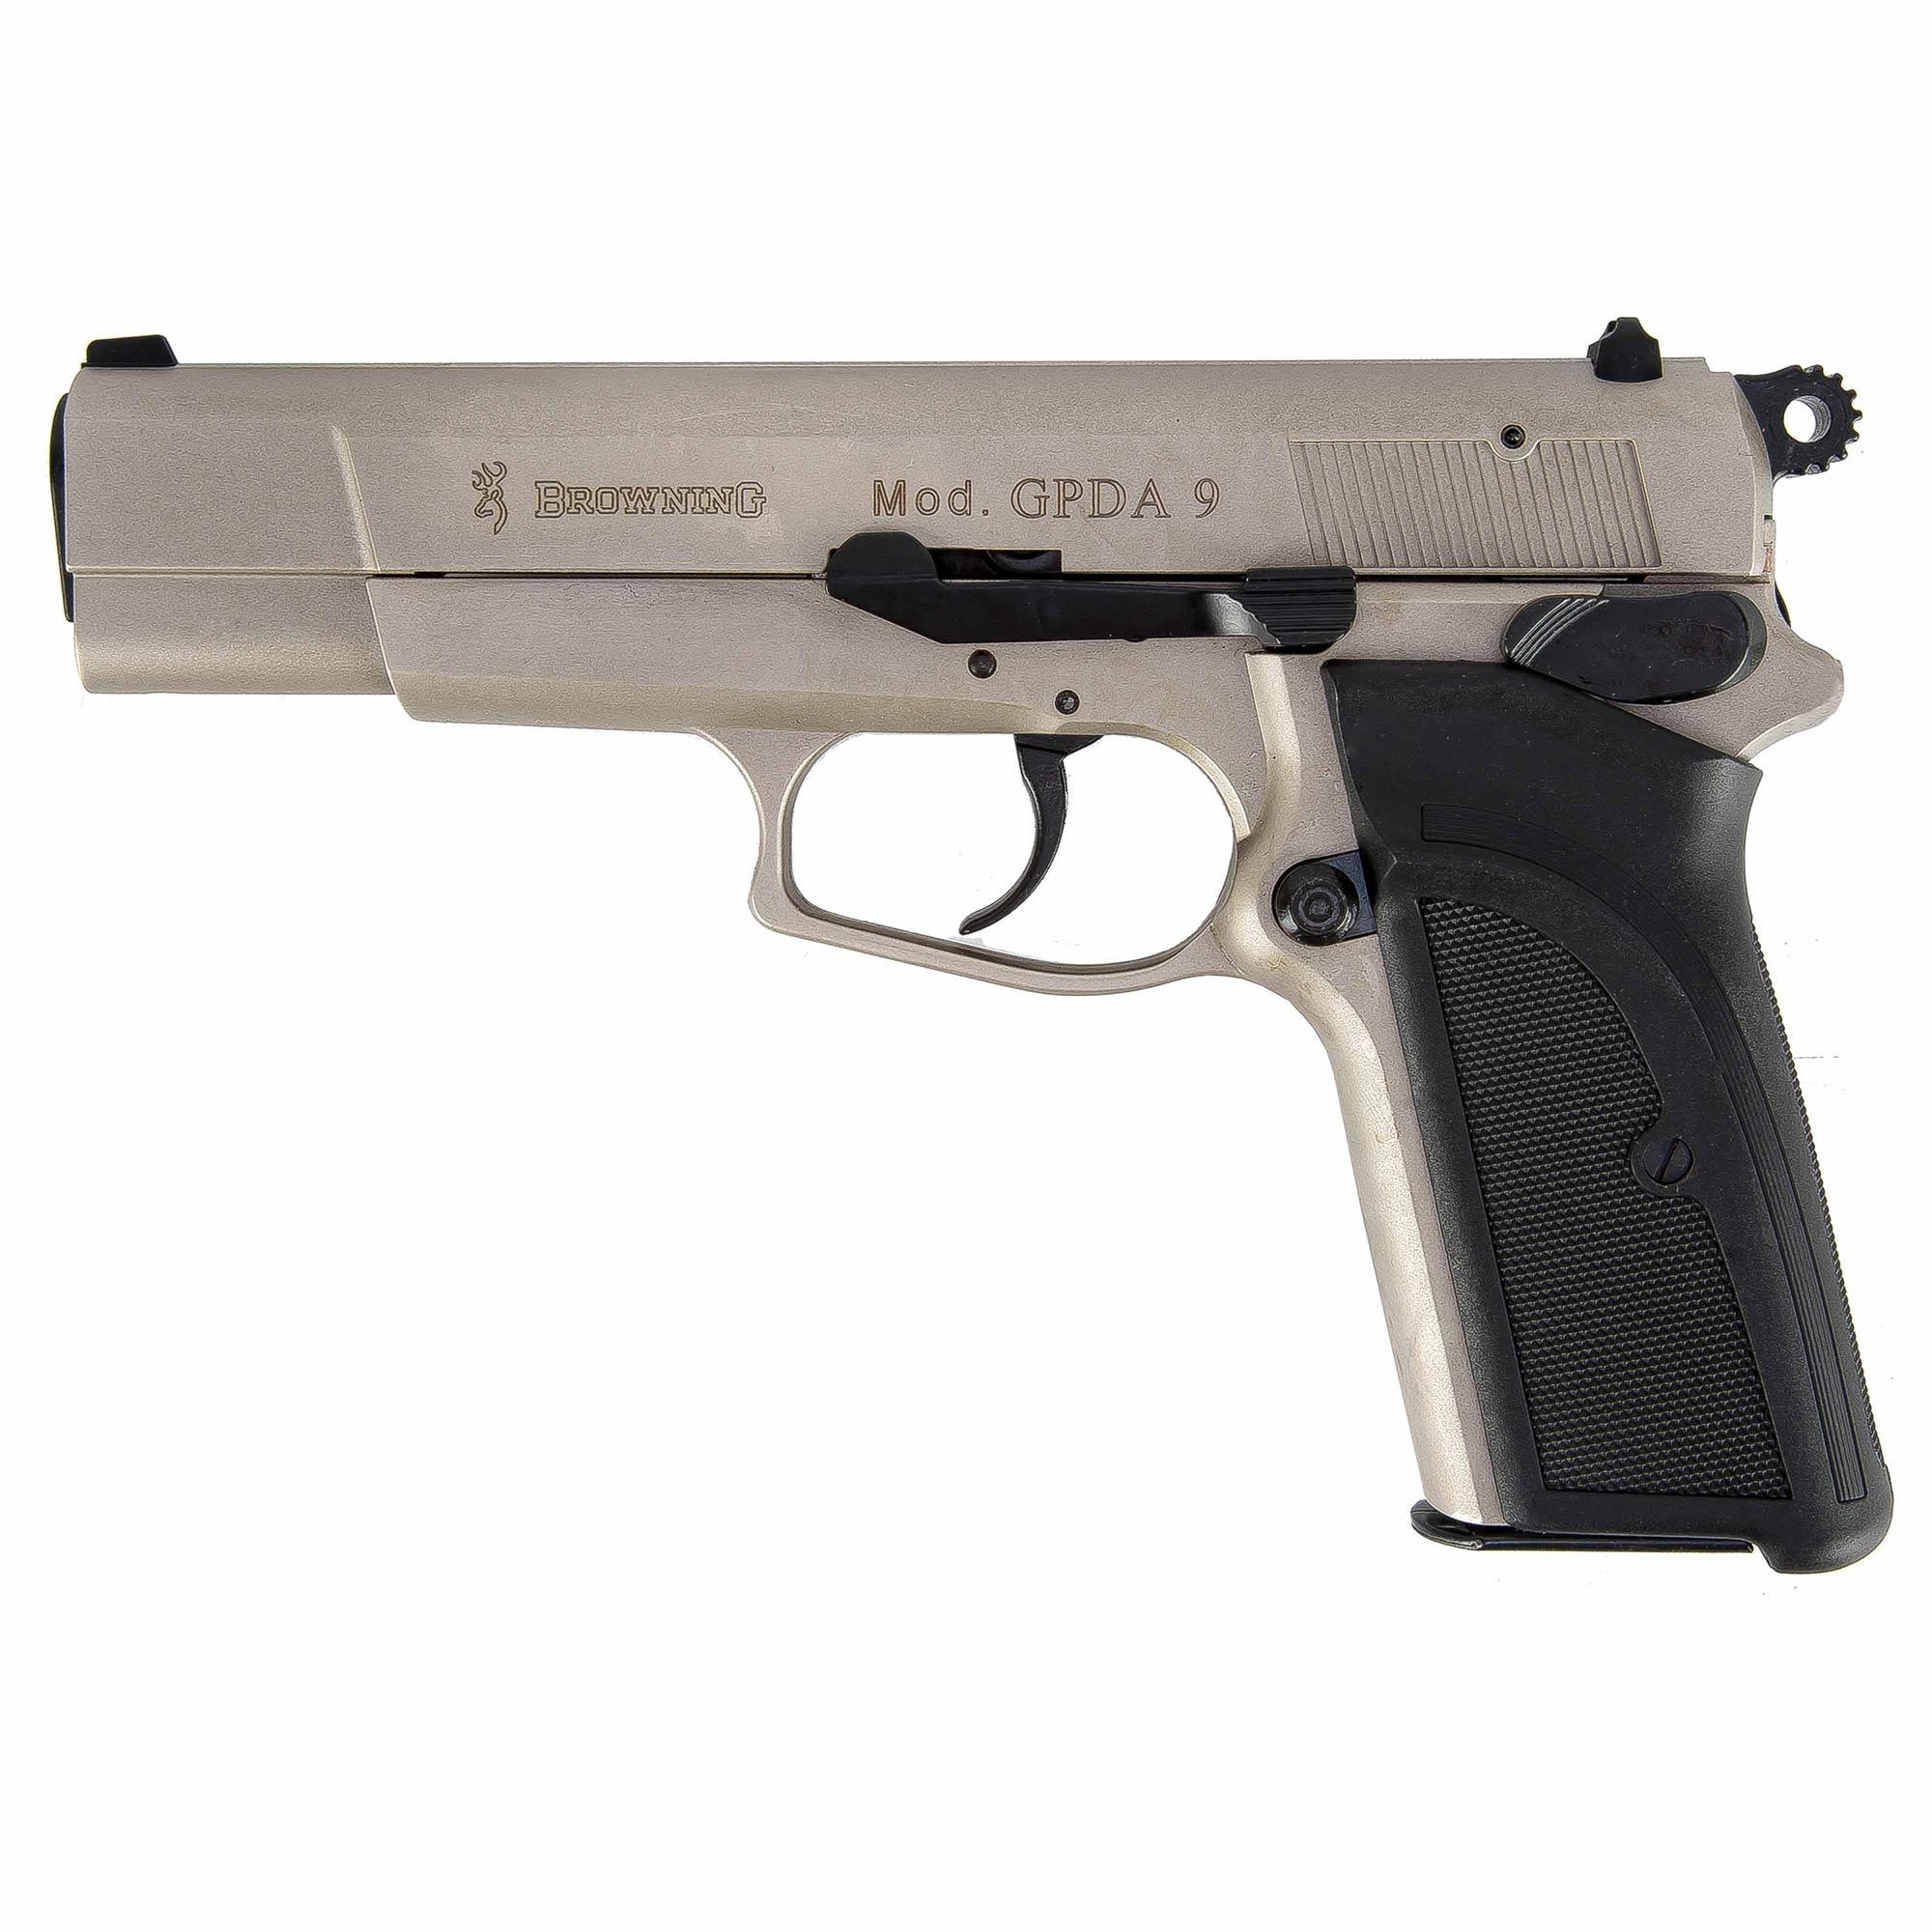 Pistole Browning GPDA9 nickel plated